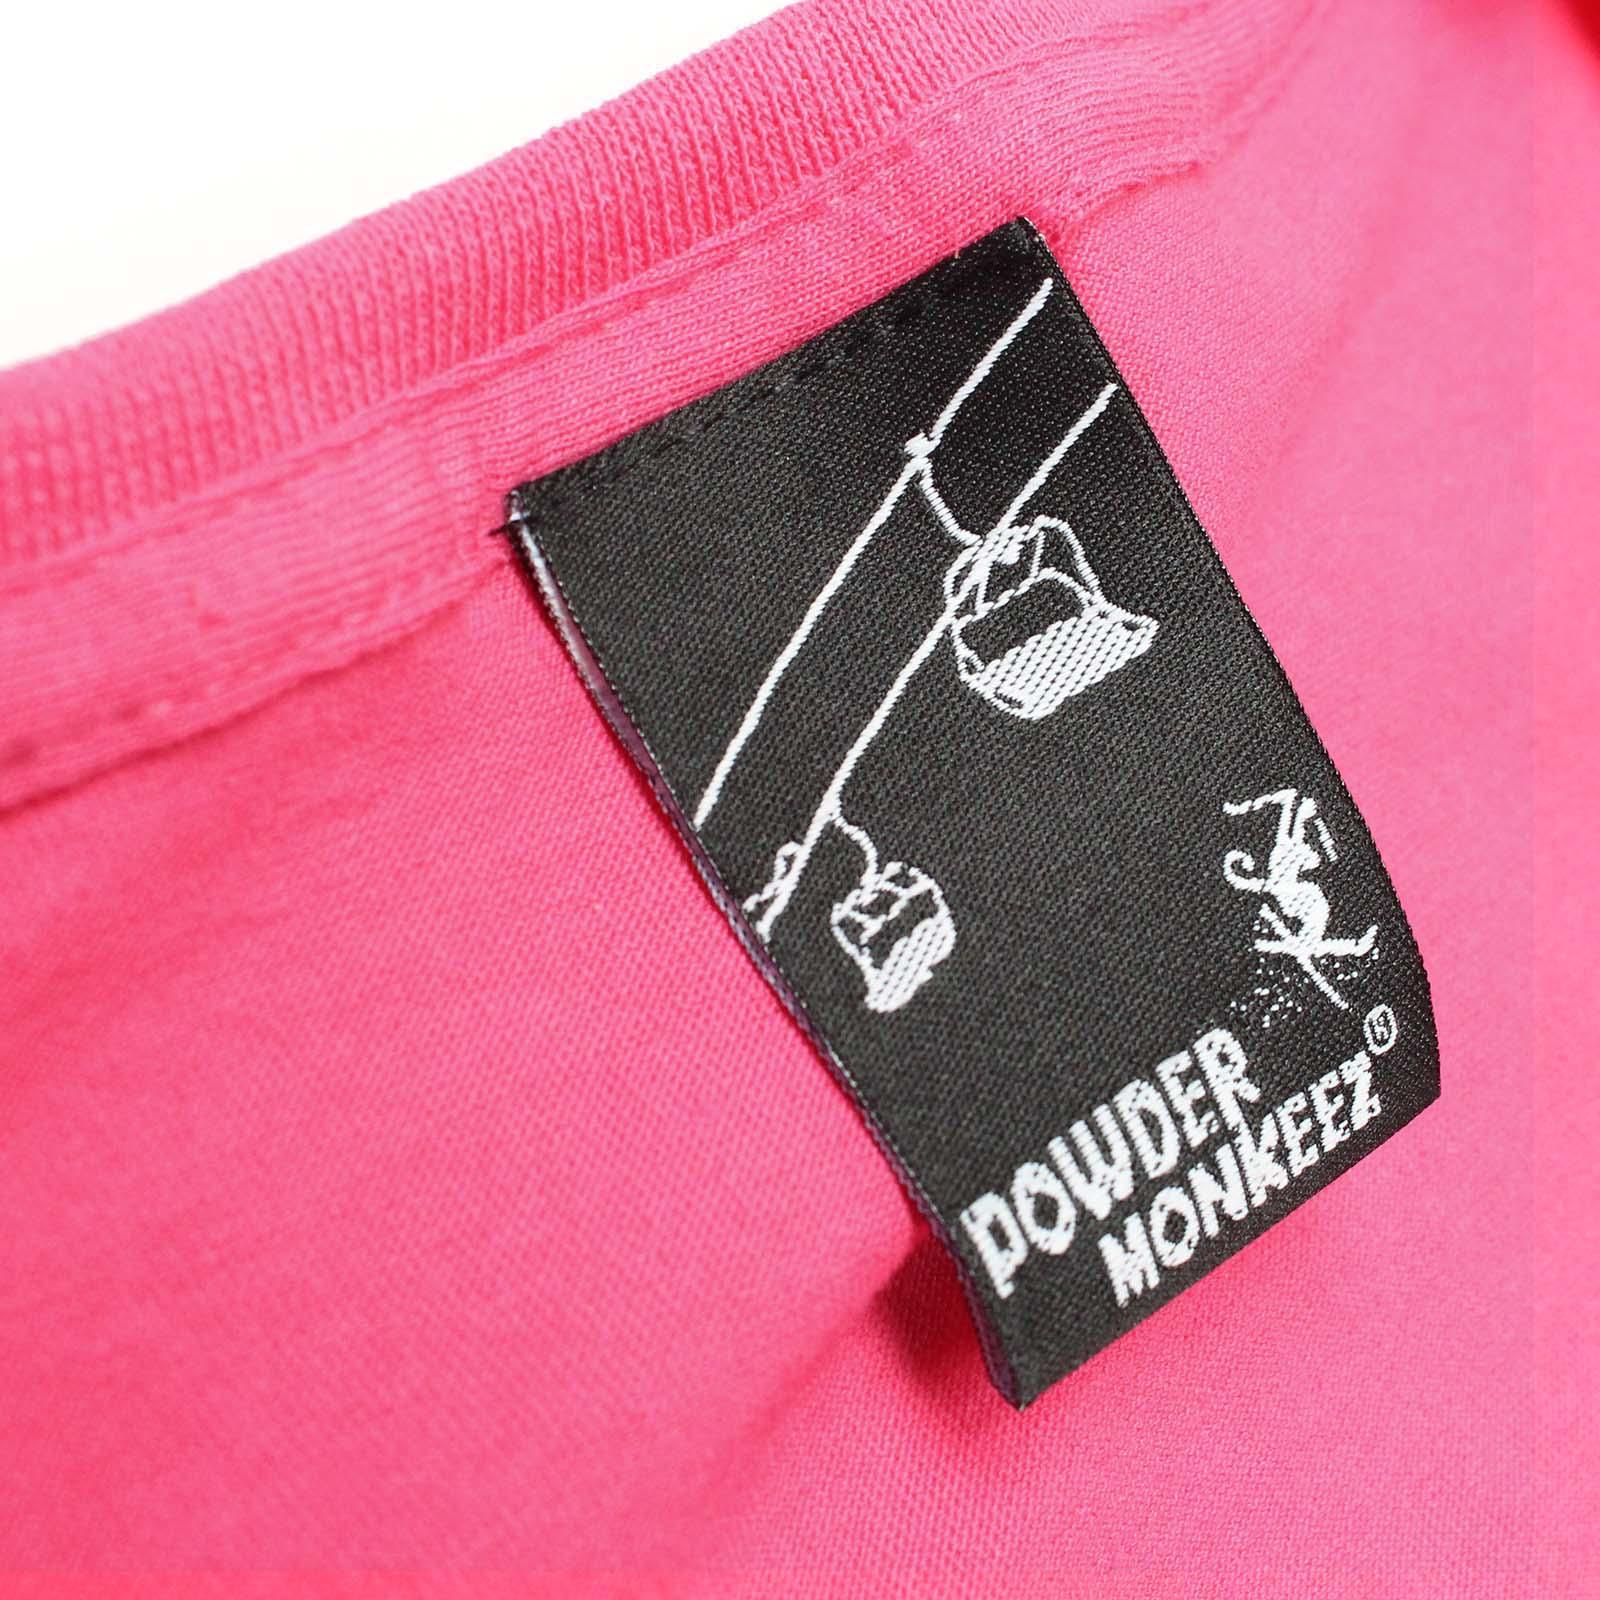 Skiing-Ski-Tops-T-Shirt-Funny-Novelty-Womens-tee-Ski-I-Ski-Like-A-Gir thumbnail 16